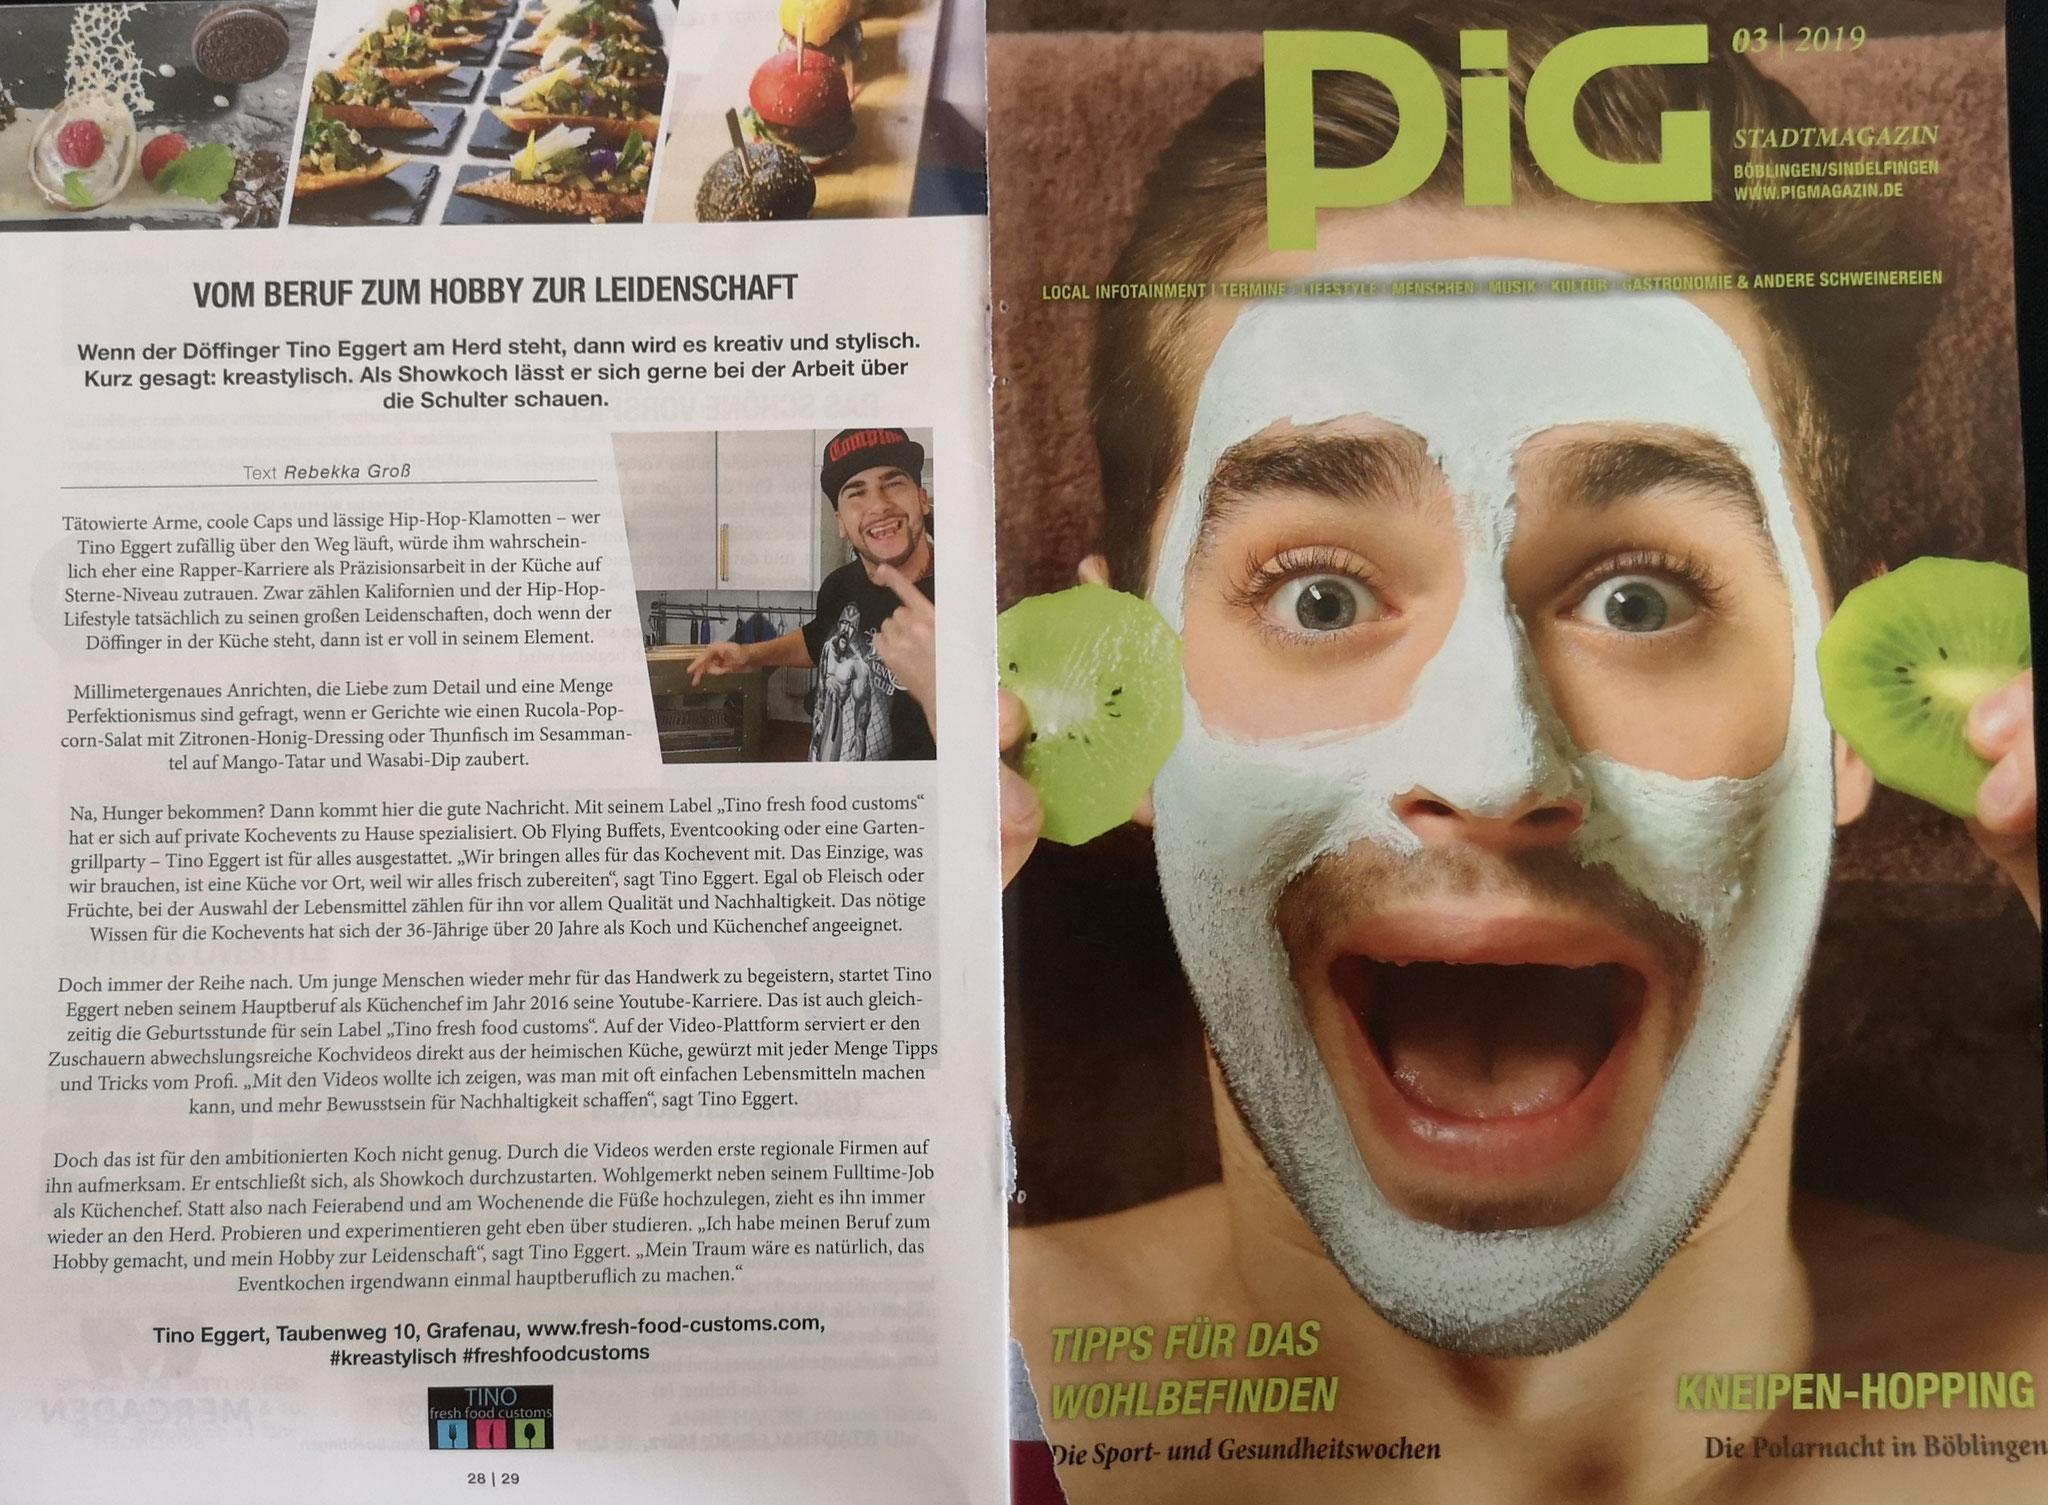 PiG Stadtmagazin 03/2019